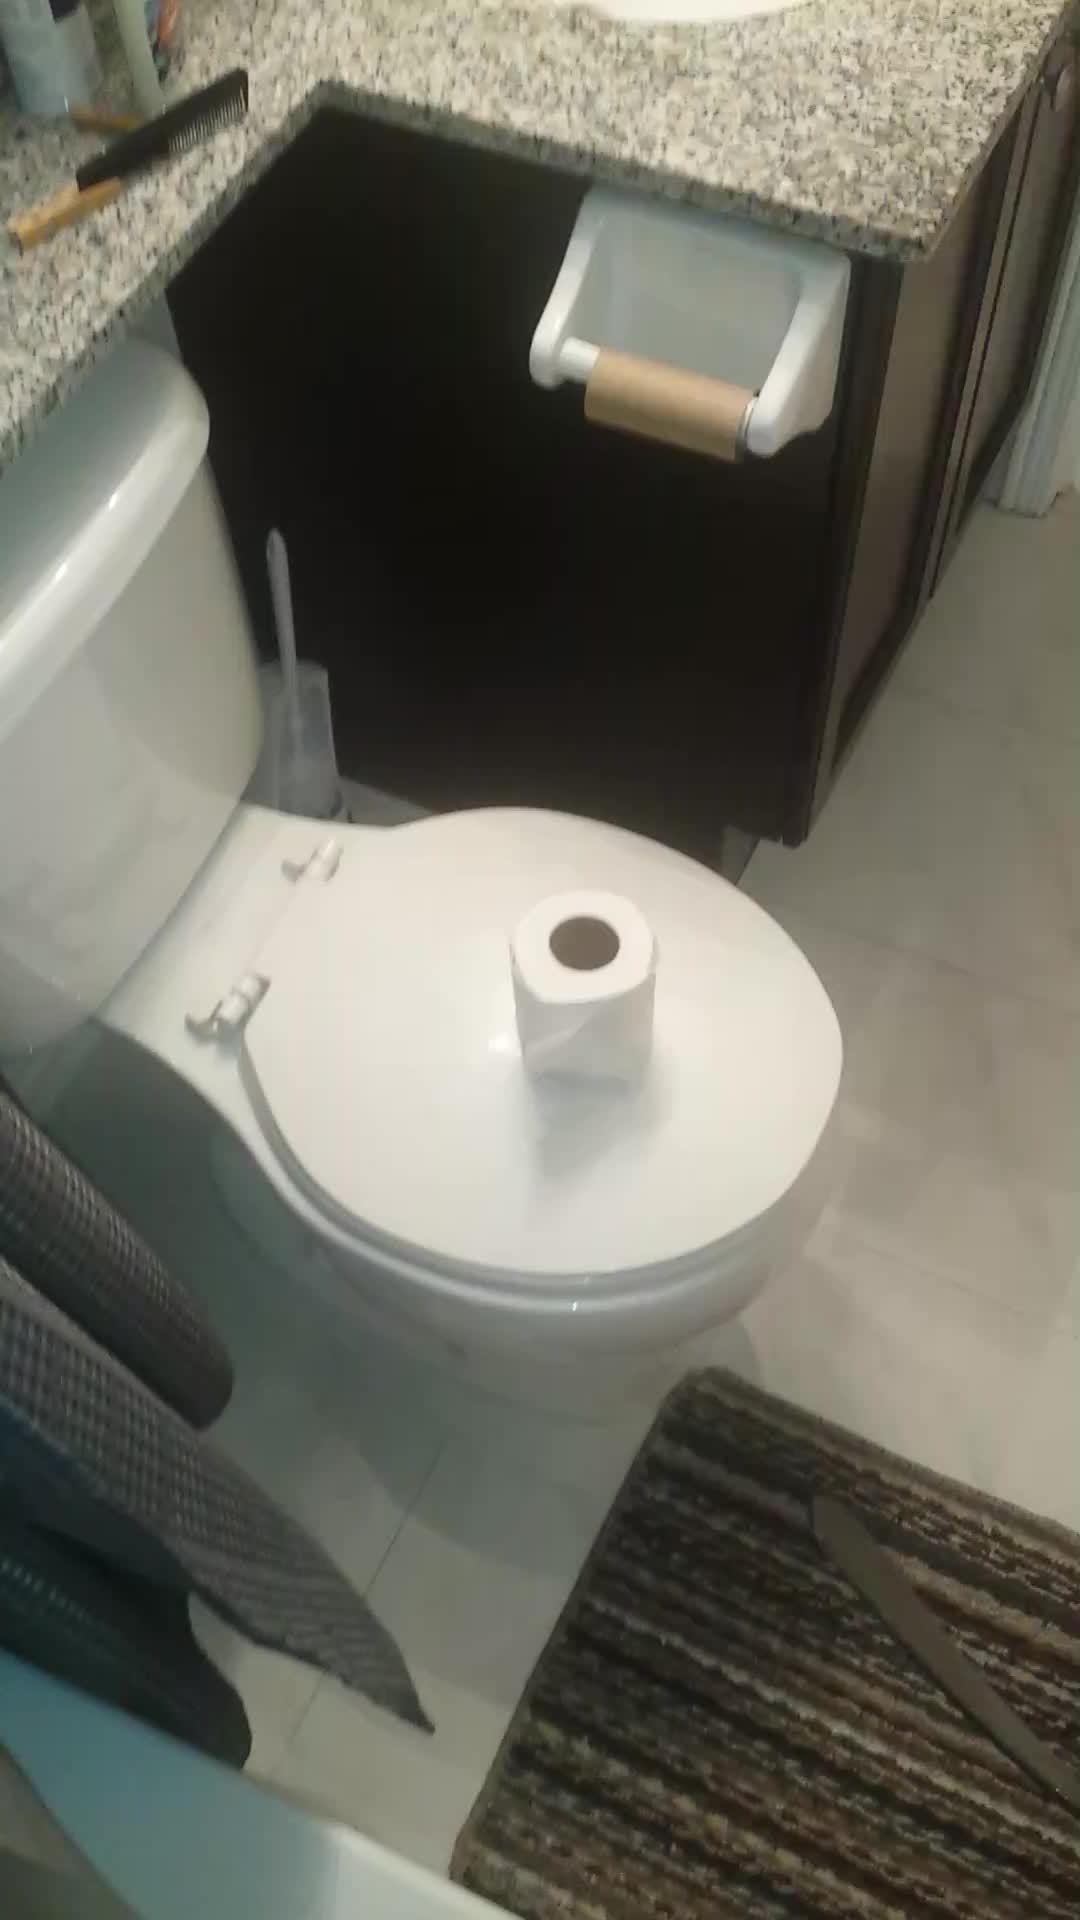 bakanewsjp, gifs, Replace your toilet paper the Canadian way GIFs